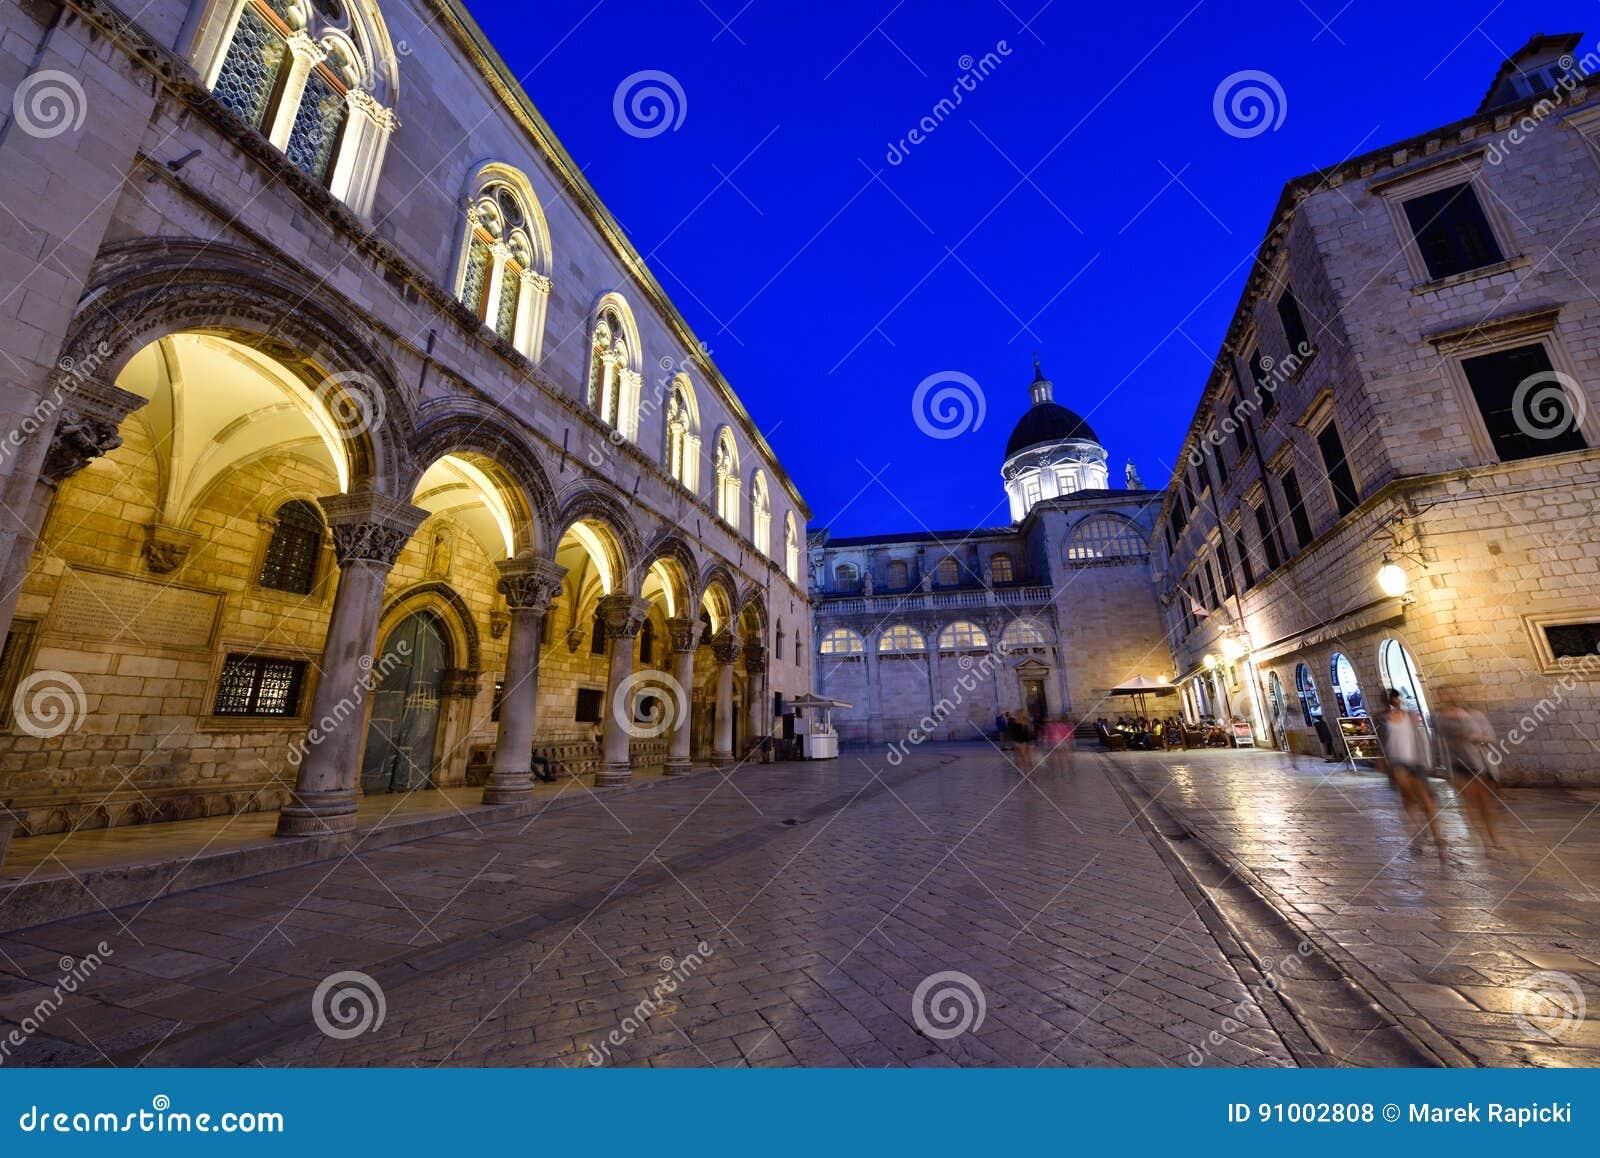 DUBROVNIK, παλαιά πόλη της ΚΡΟΑΤΙΑΣ - Dubrovnik